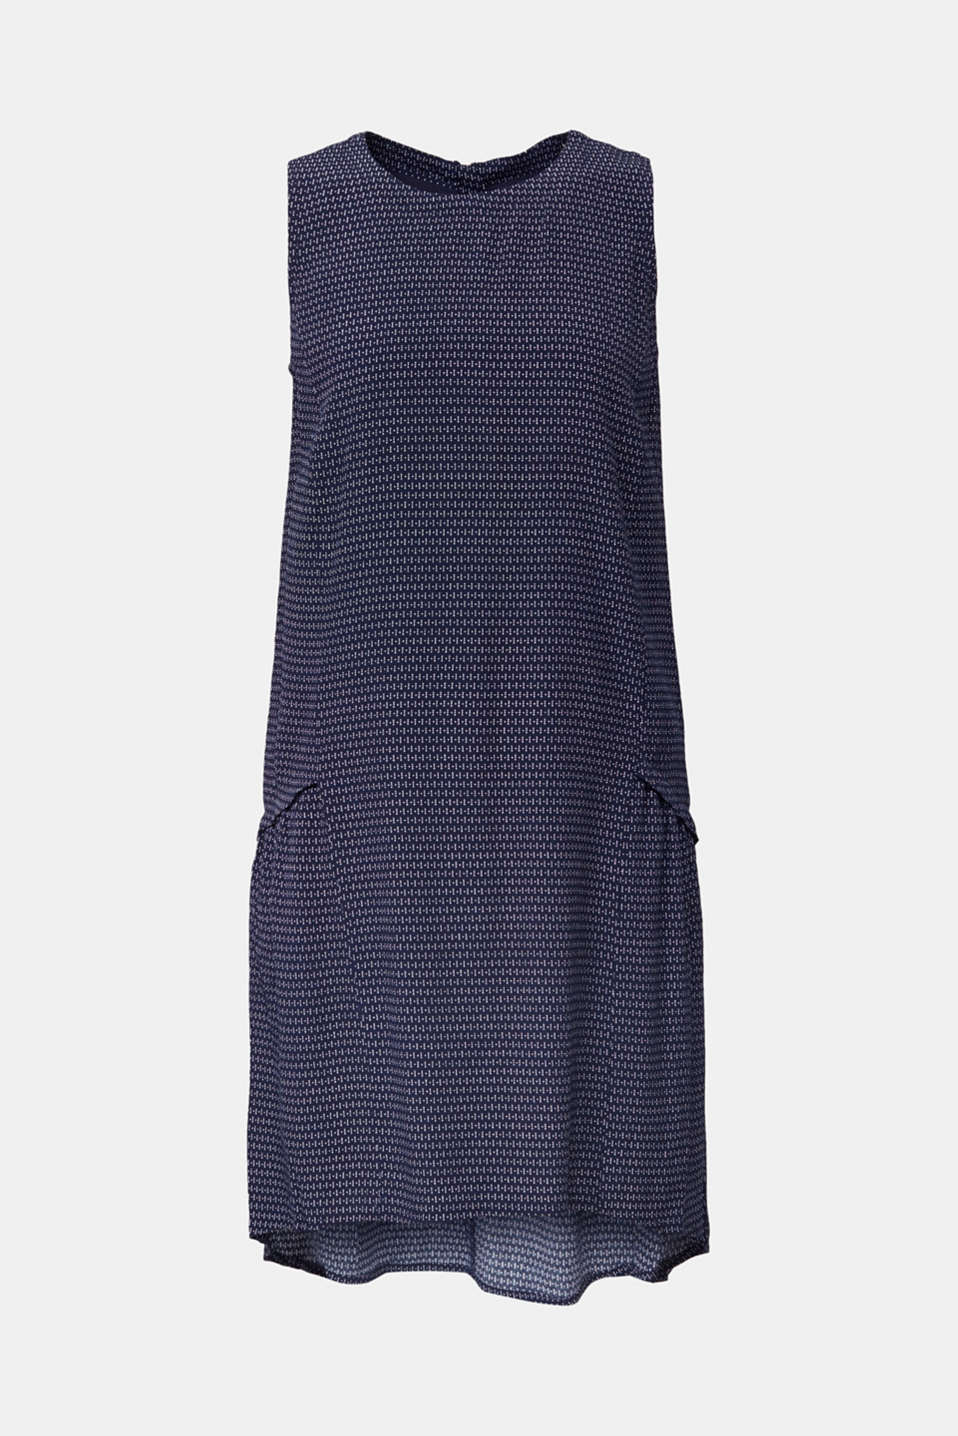 LENZING™ ECOVERO™ flounce dress, NAVY 3, detail image number 7